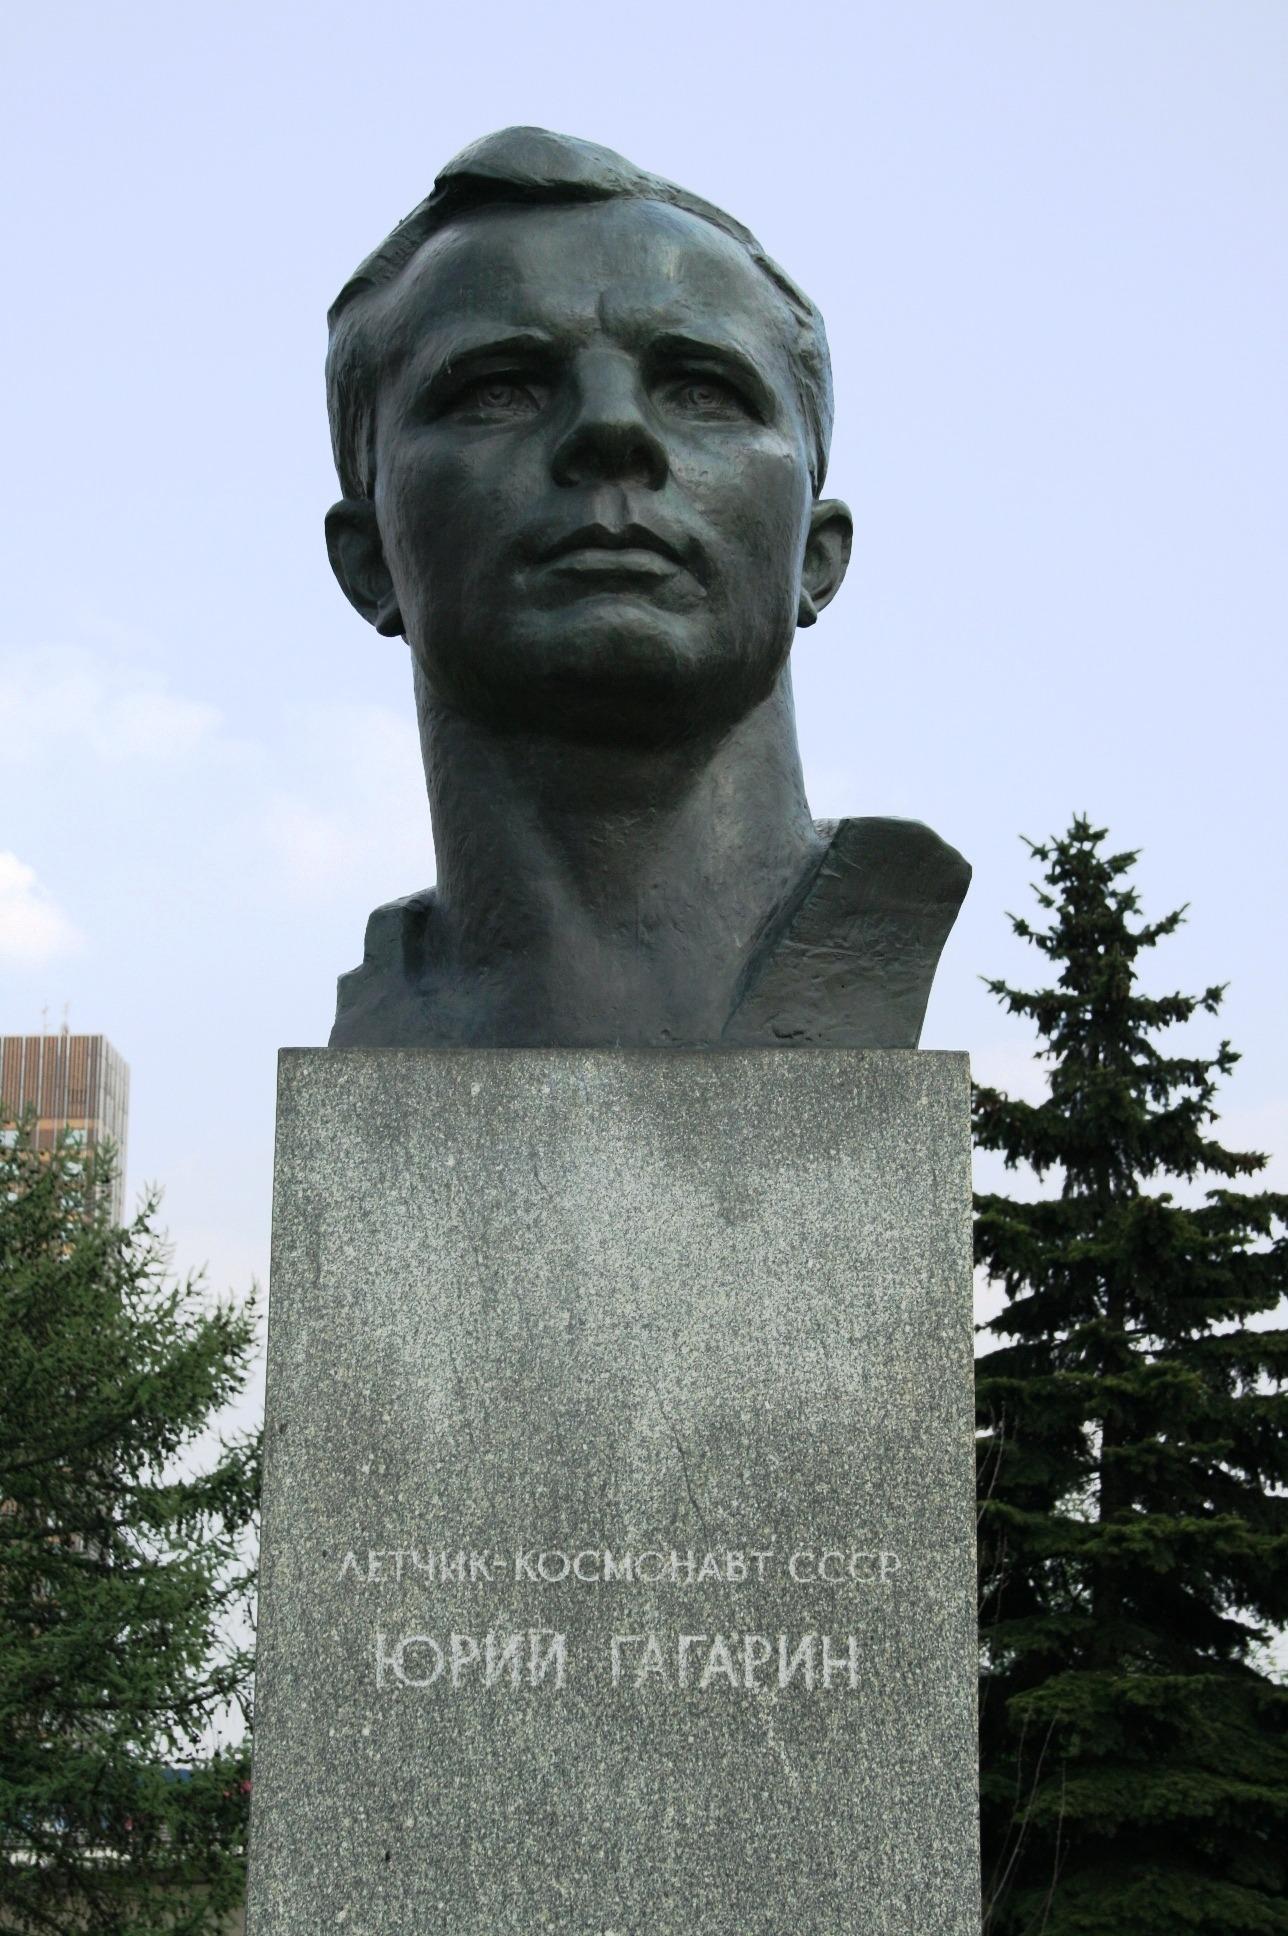 Fotos gratis : Monumento, estatua, escultura, memorial ...